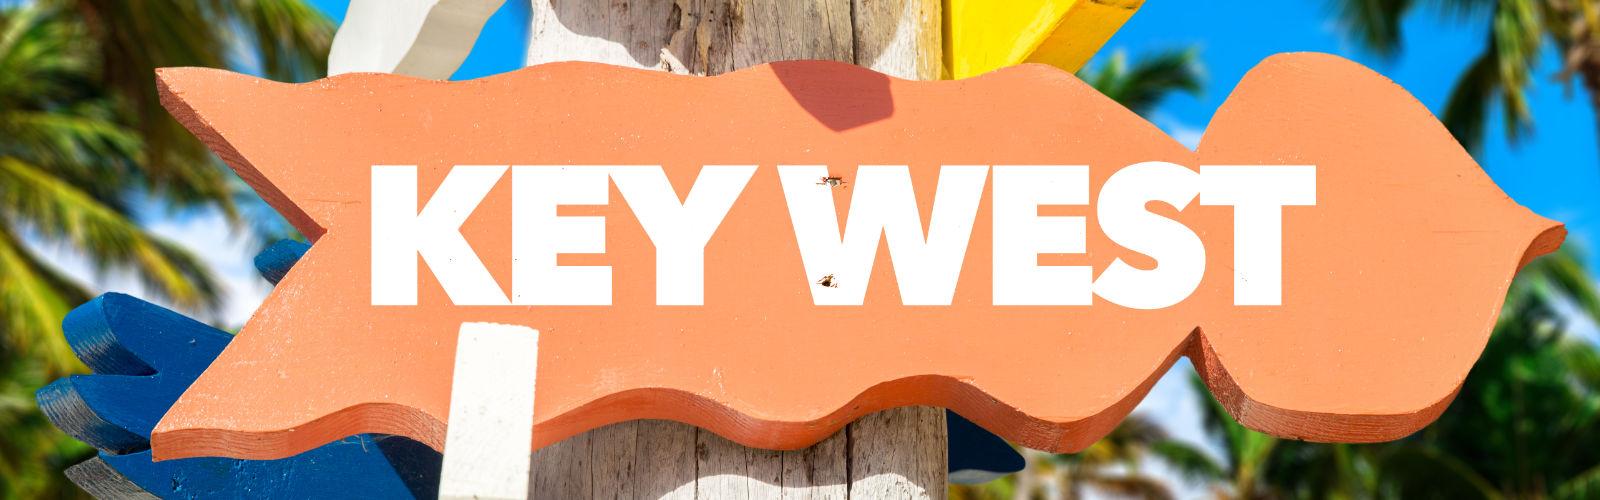 Key West sign